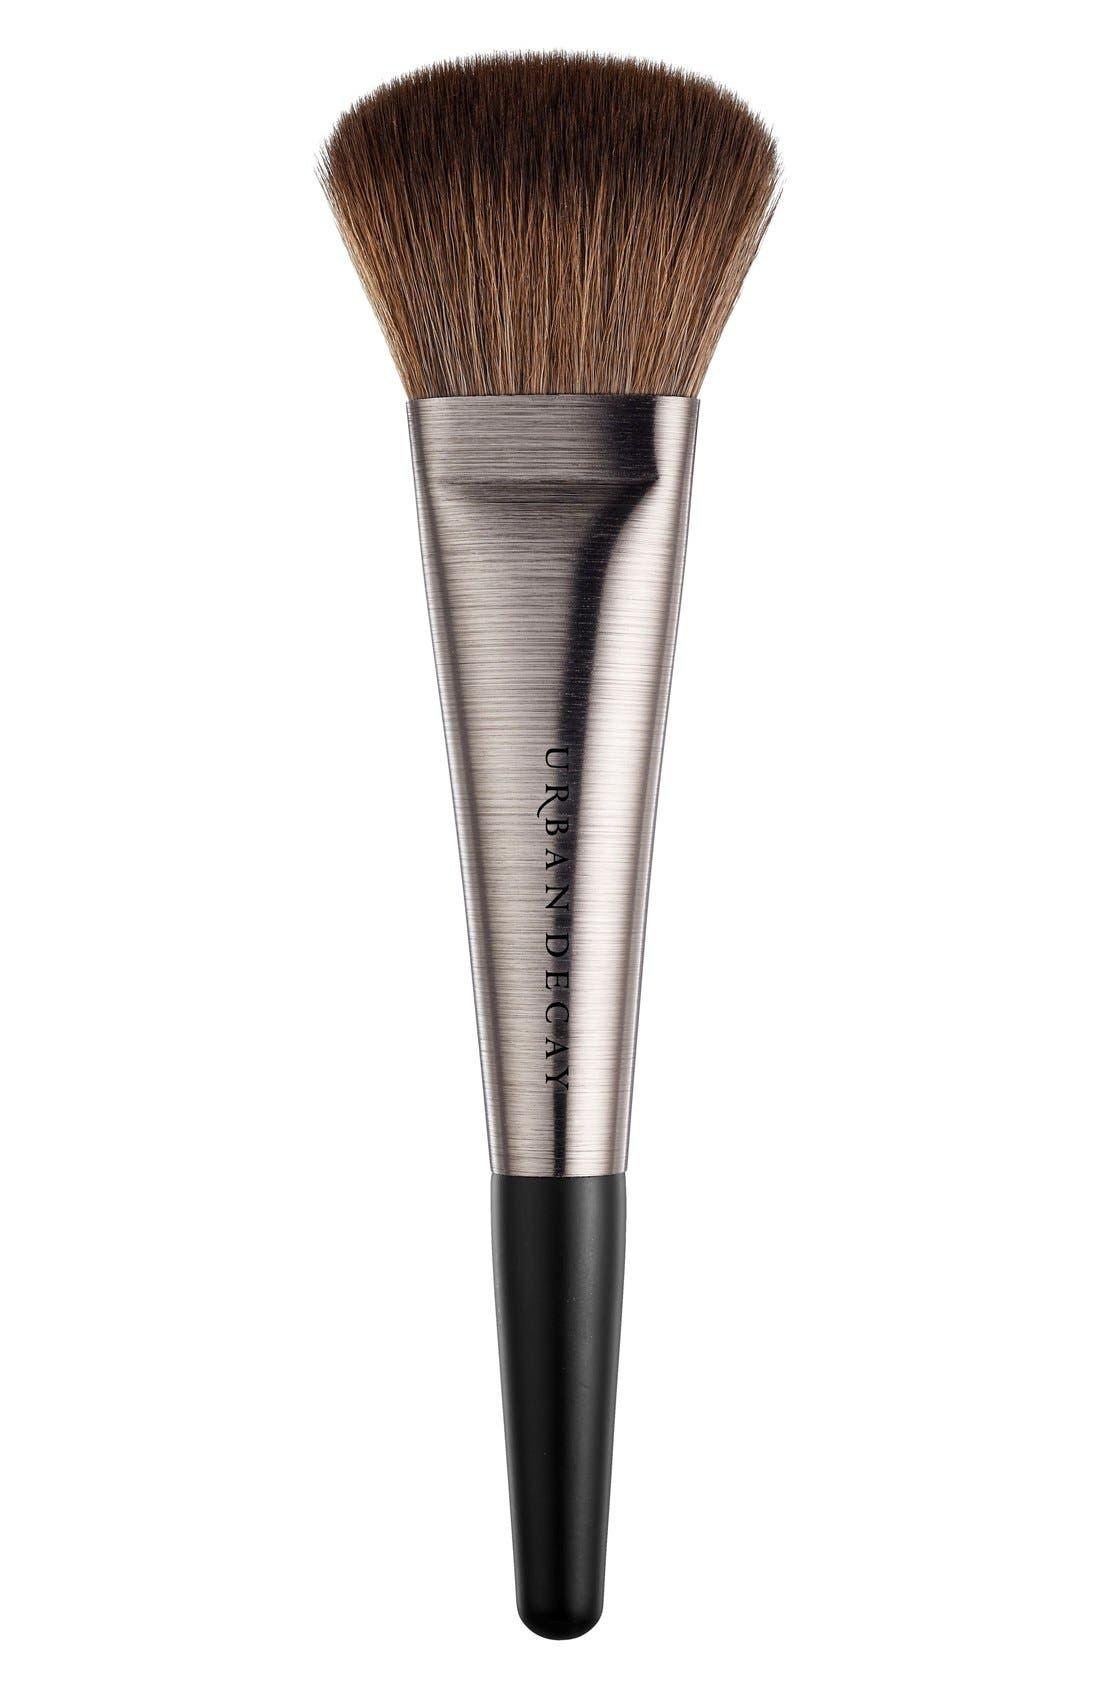 Pro Large Powder Brush,                         Main,                         color, 000